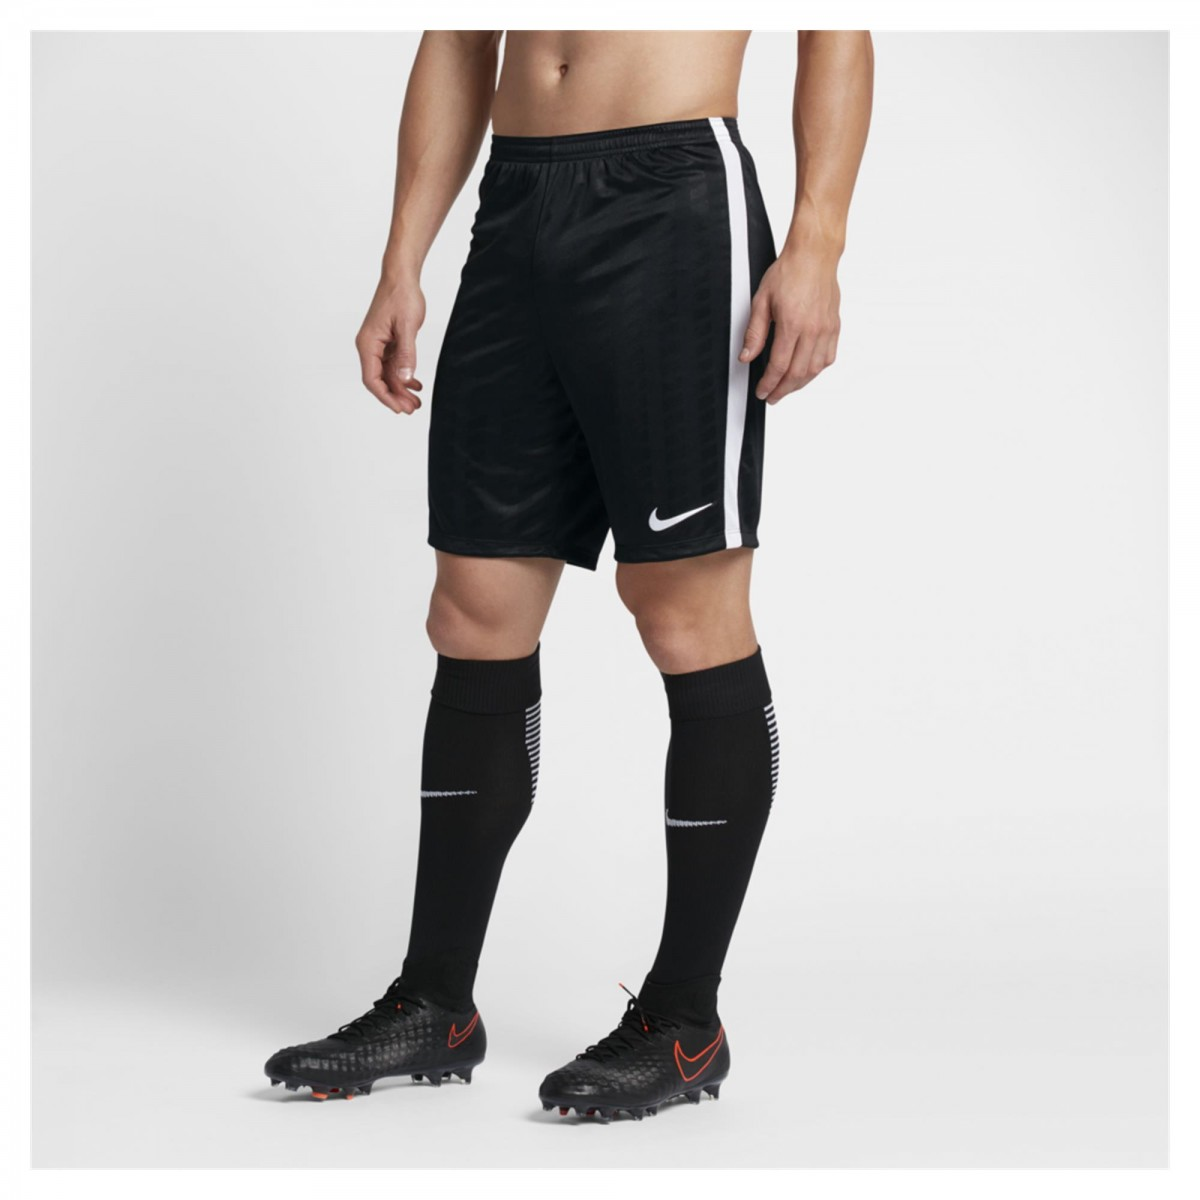 b6fc7397cf Bizz Store - Shorts Masculino Nike Academy Jacquard Futebol Preto